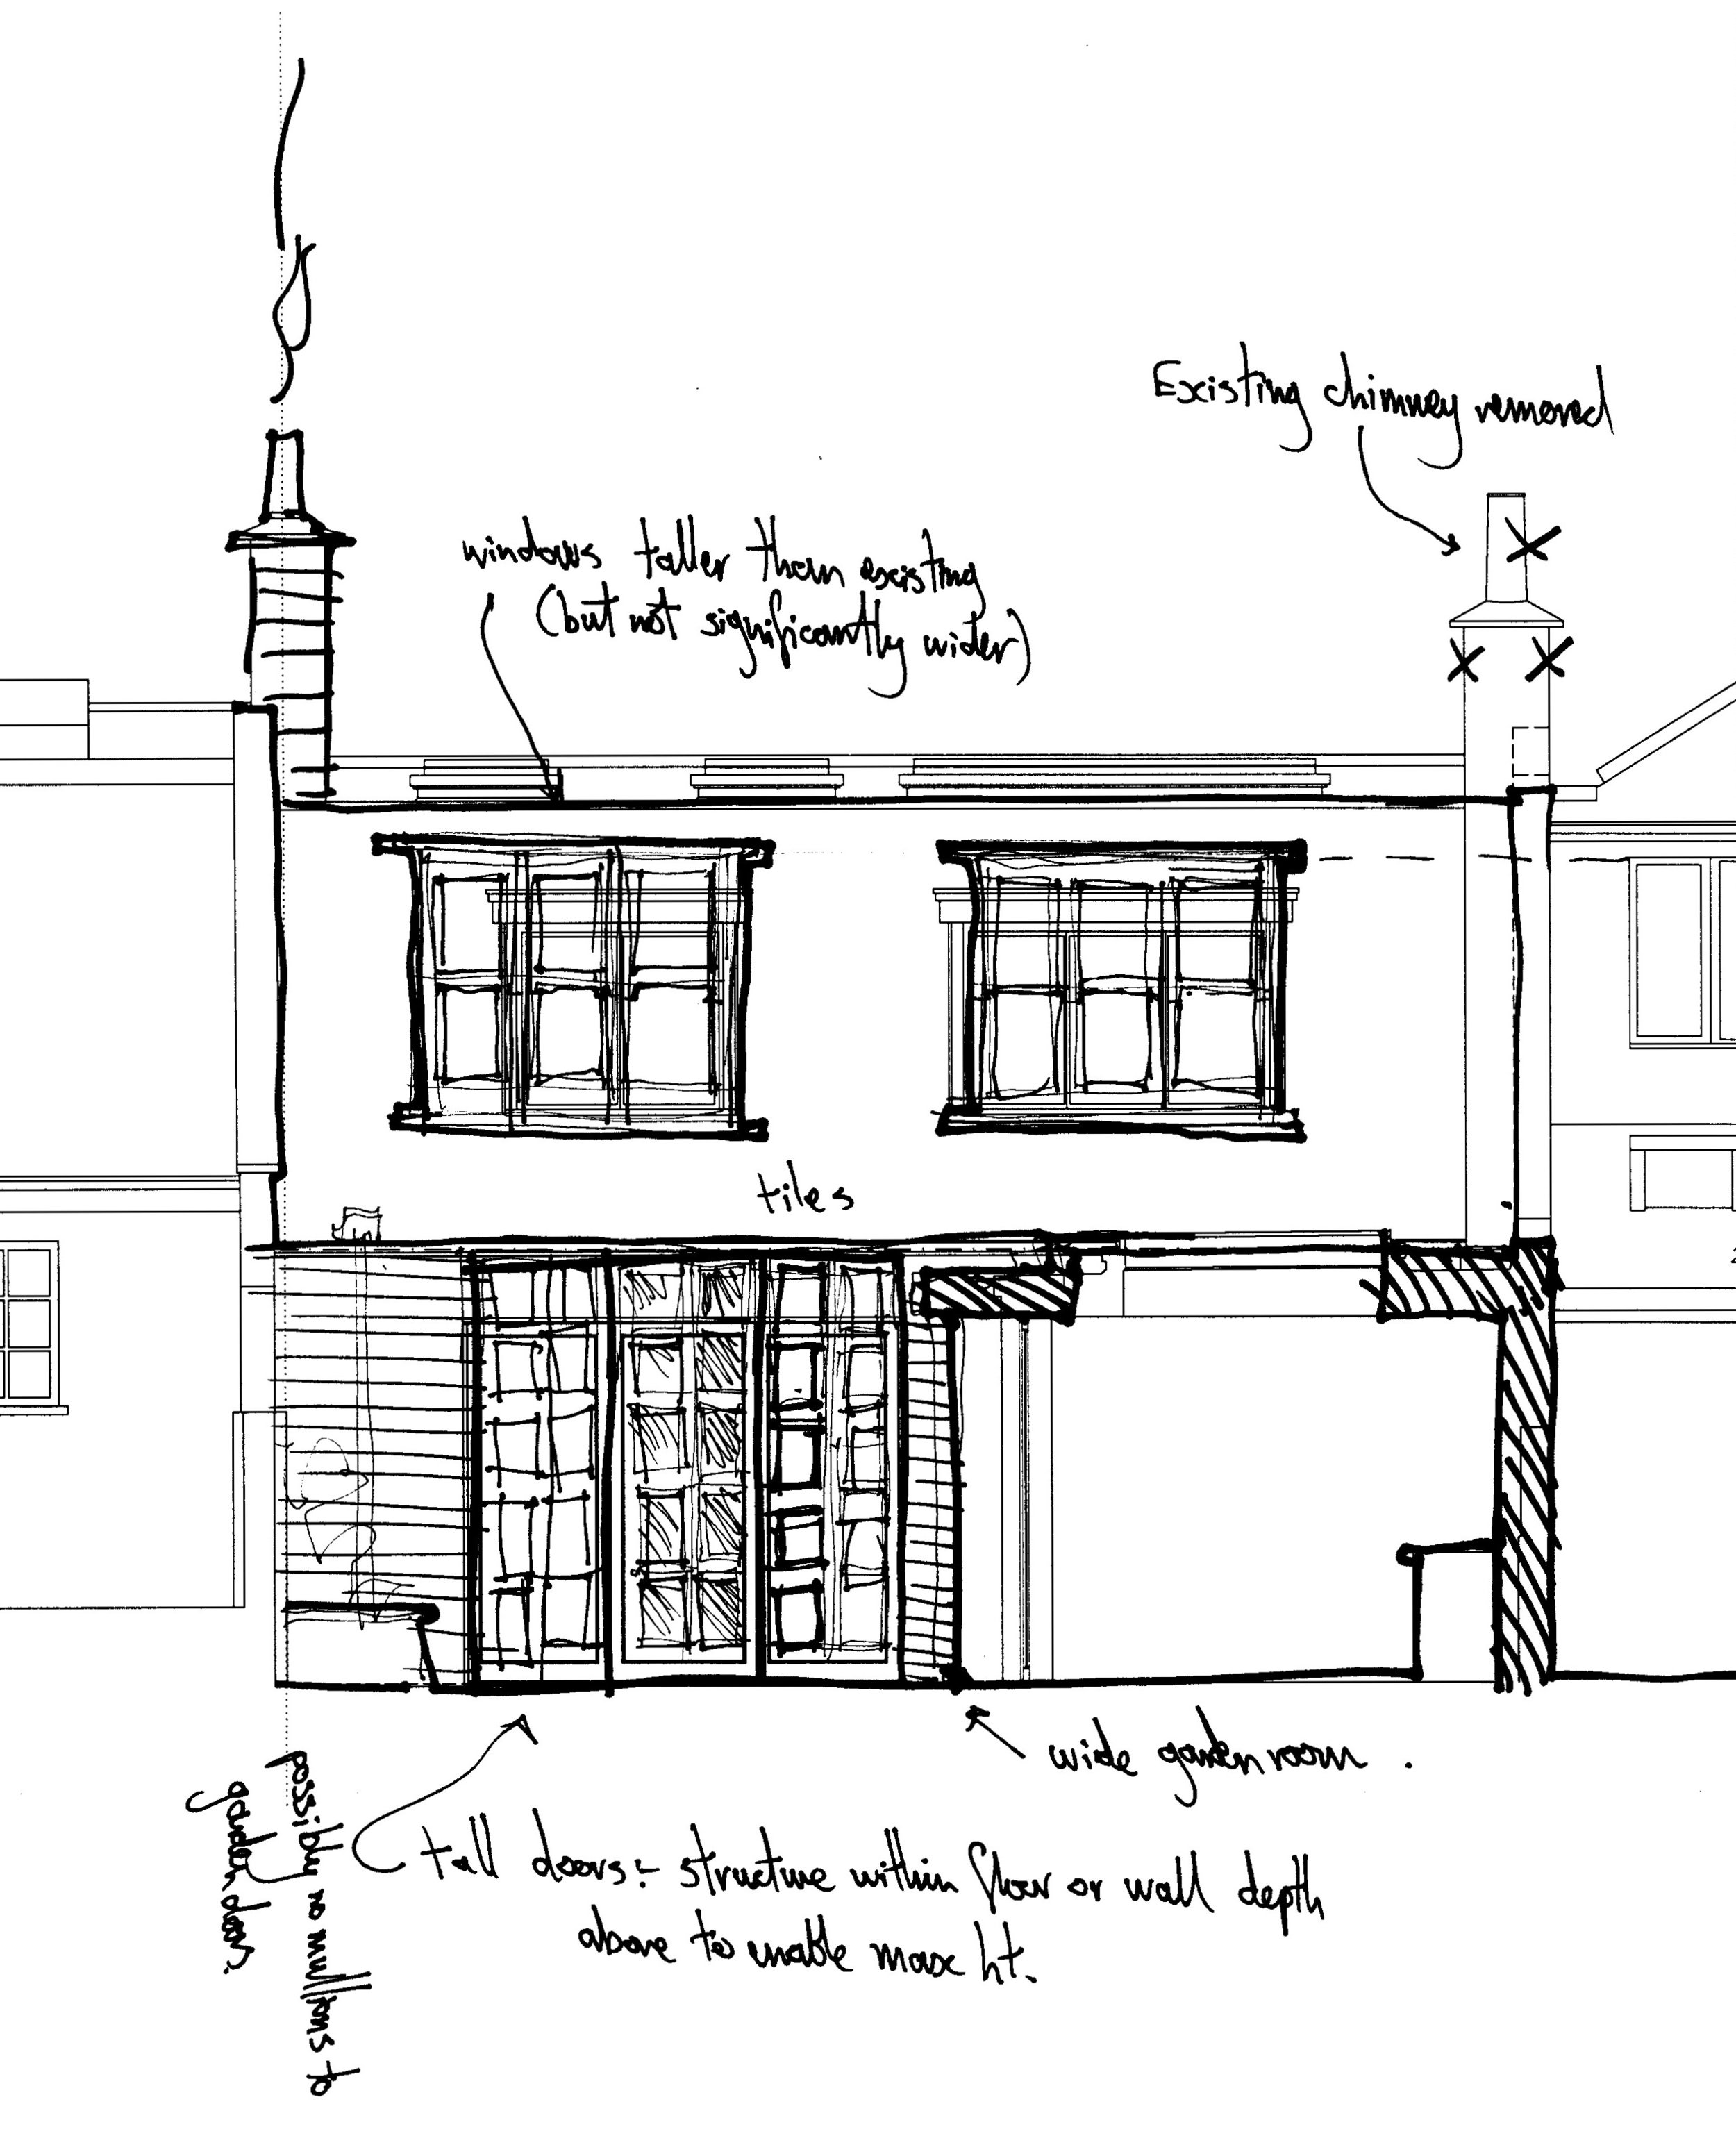 FINEarchitecture_CampdenStreet_Sketch4.jpg